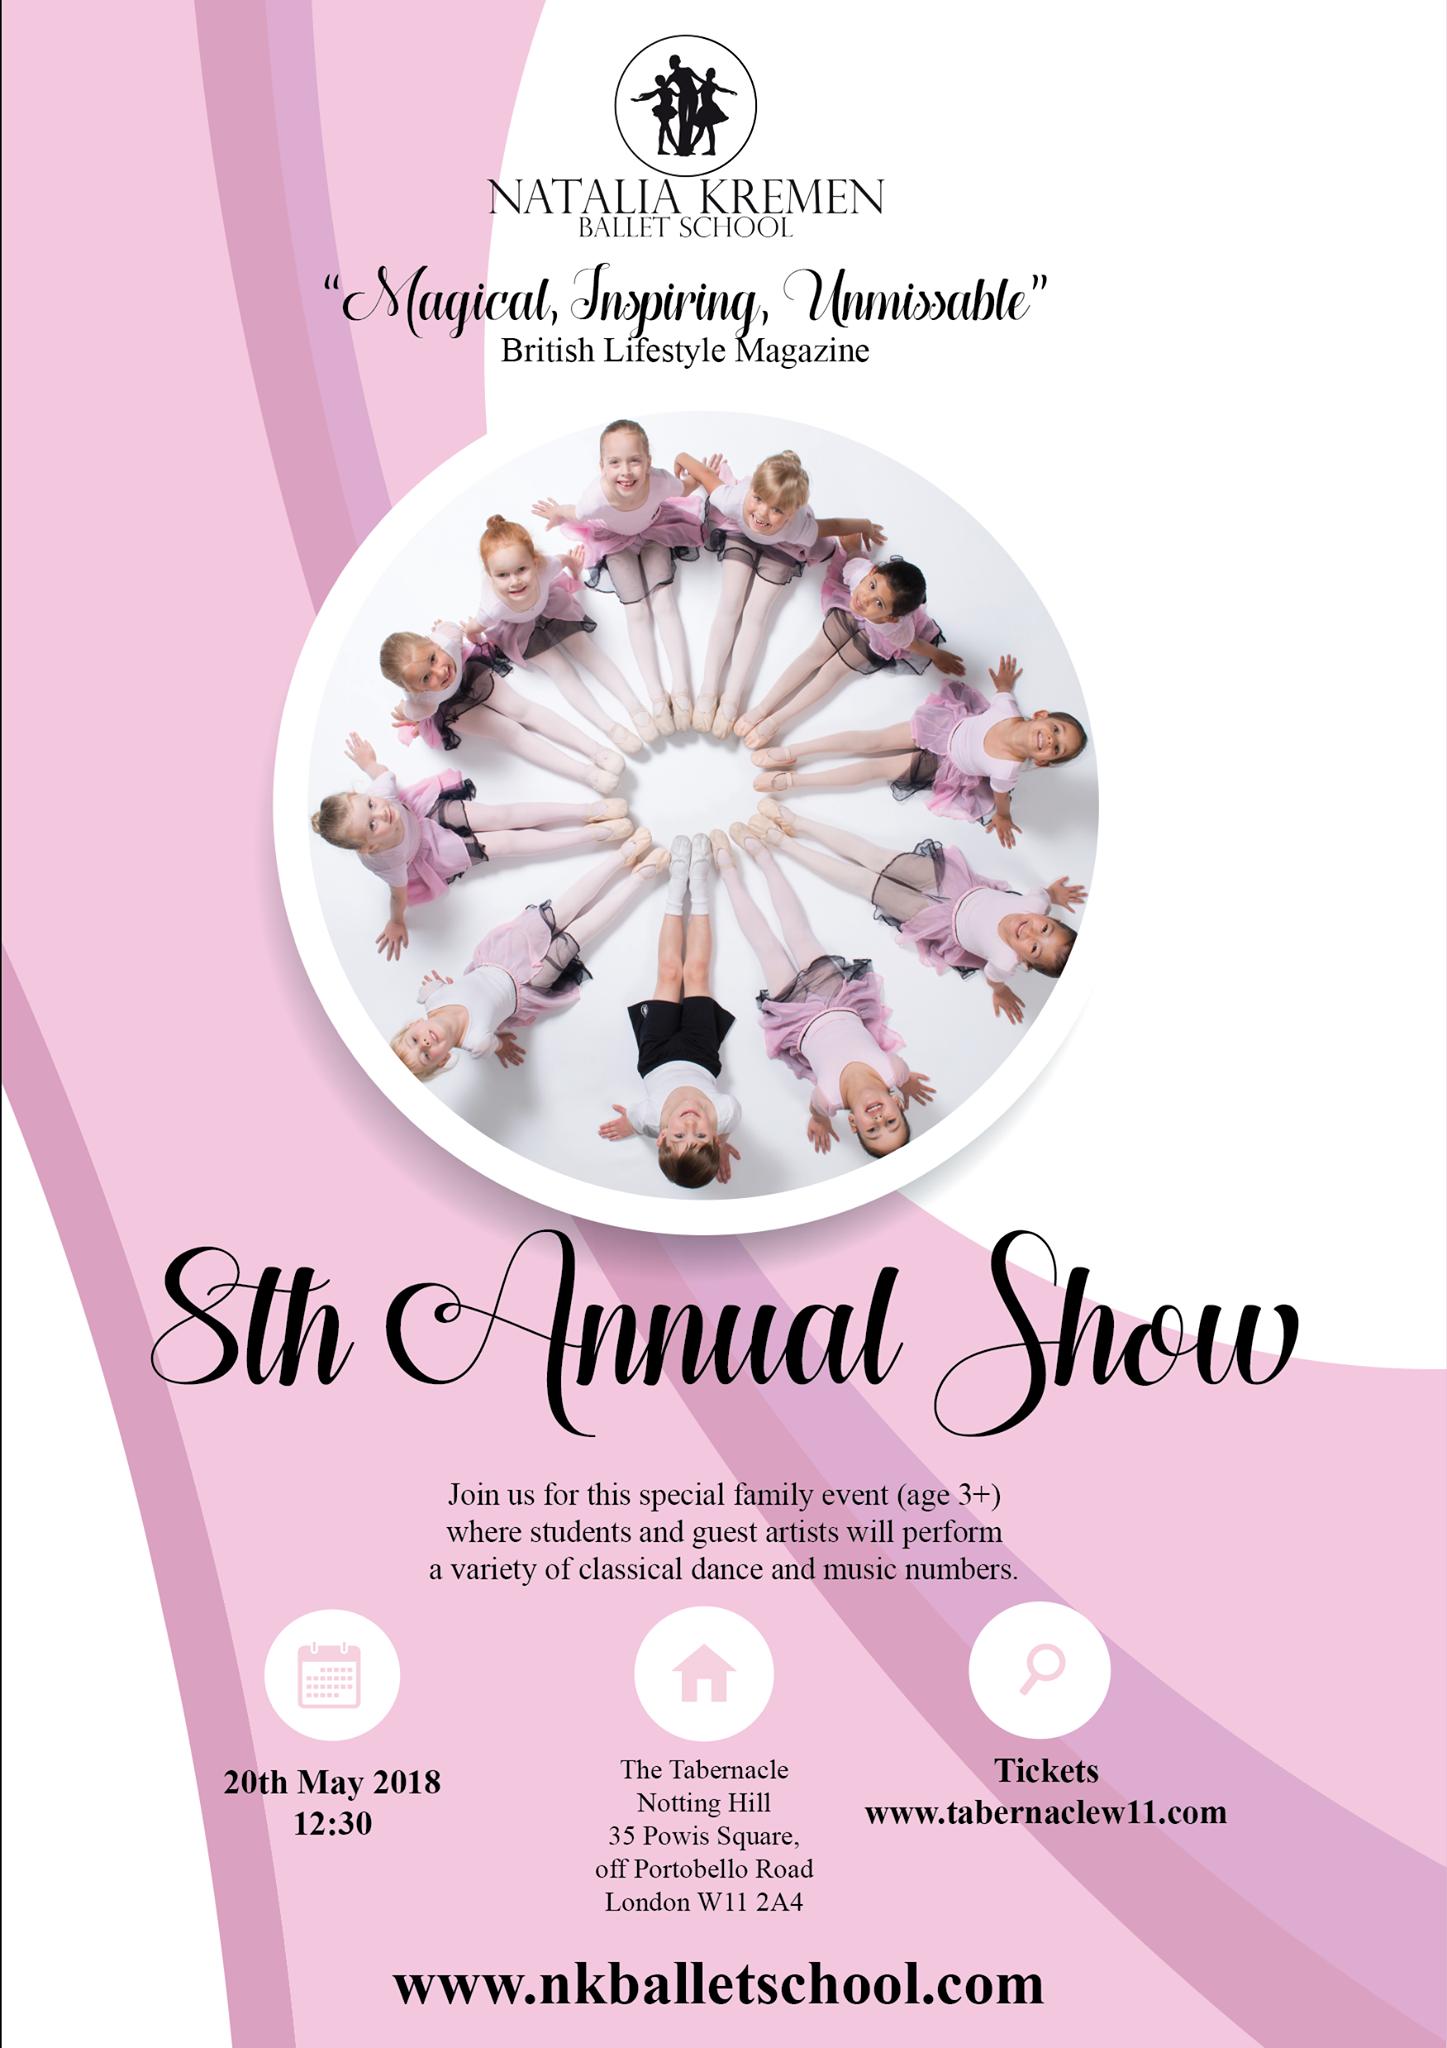 Natalia Kremen Ballet School 8th Annual School Show